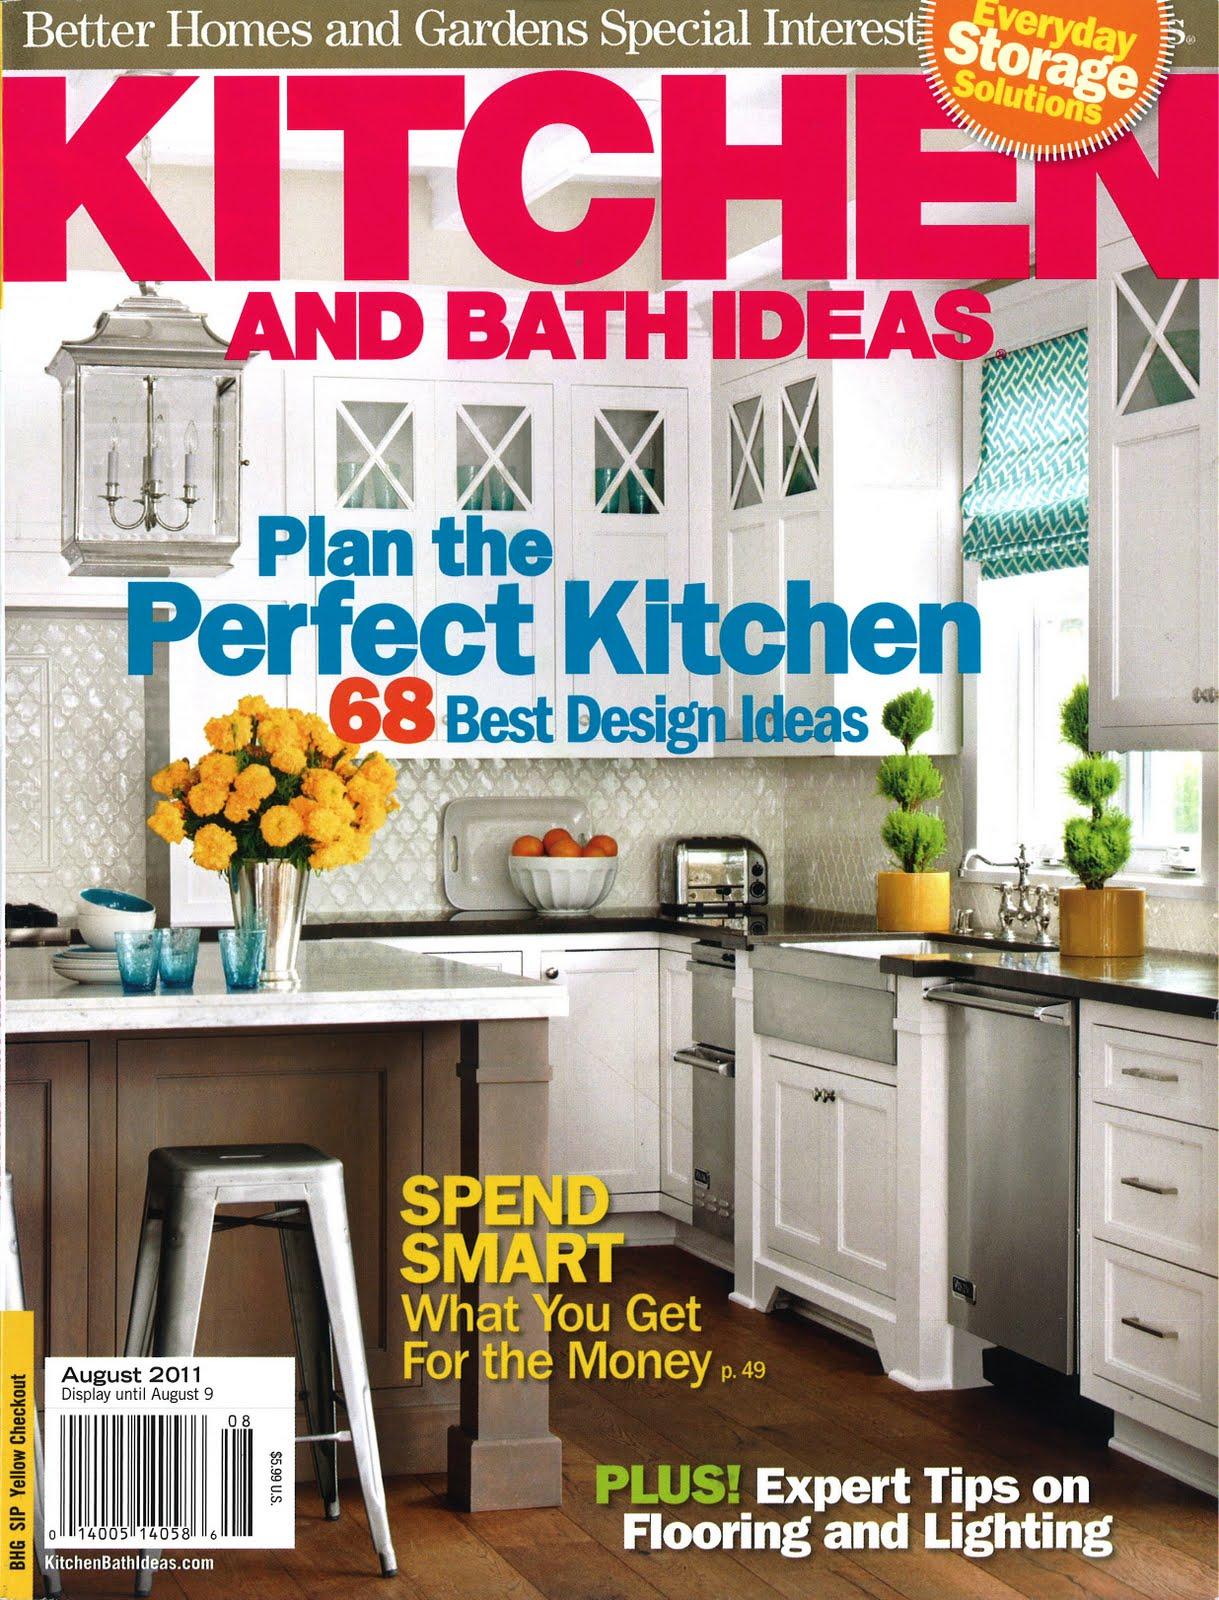 Better Homes And Gardens Bathroom Design Ideas ~ Mfa better homes gardens kitchen and bath ideas